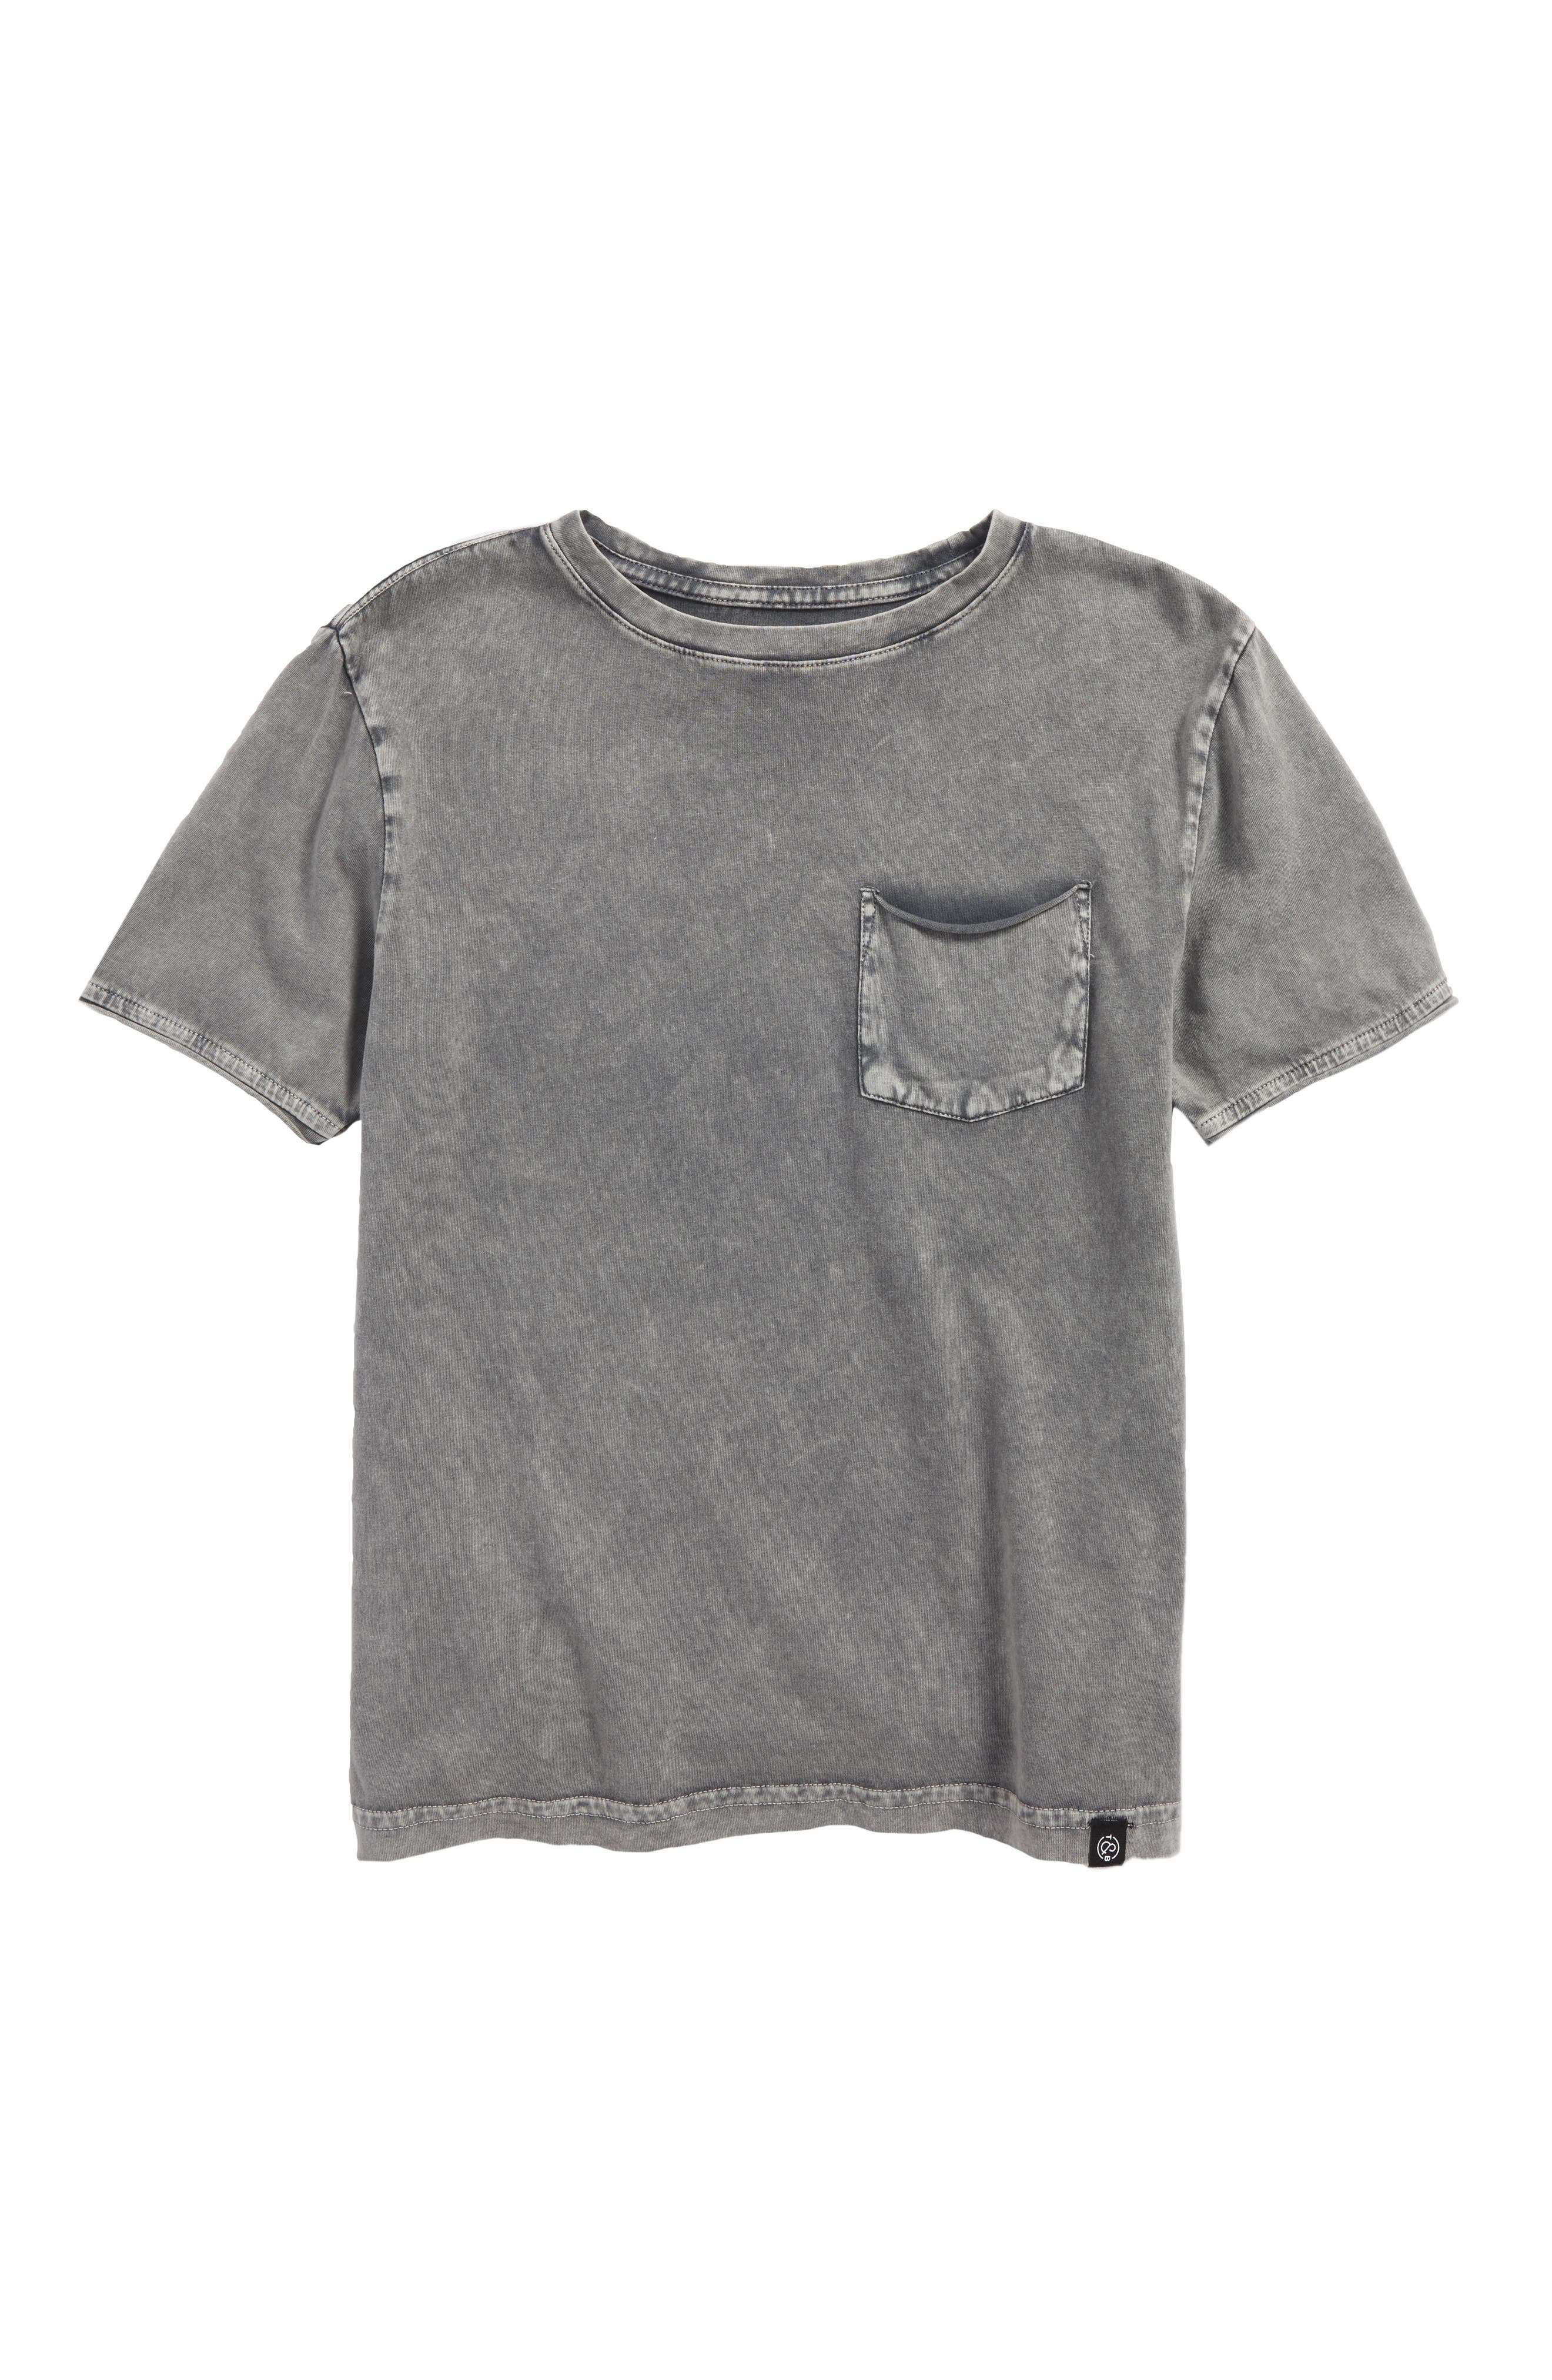 Alternate Image 1 Selected - Treasure & Bond Washed Pocket T-Shirt (Big Boys)